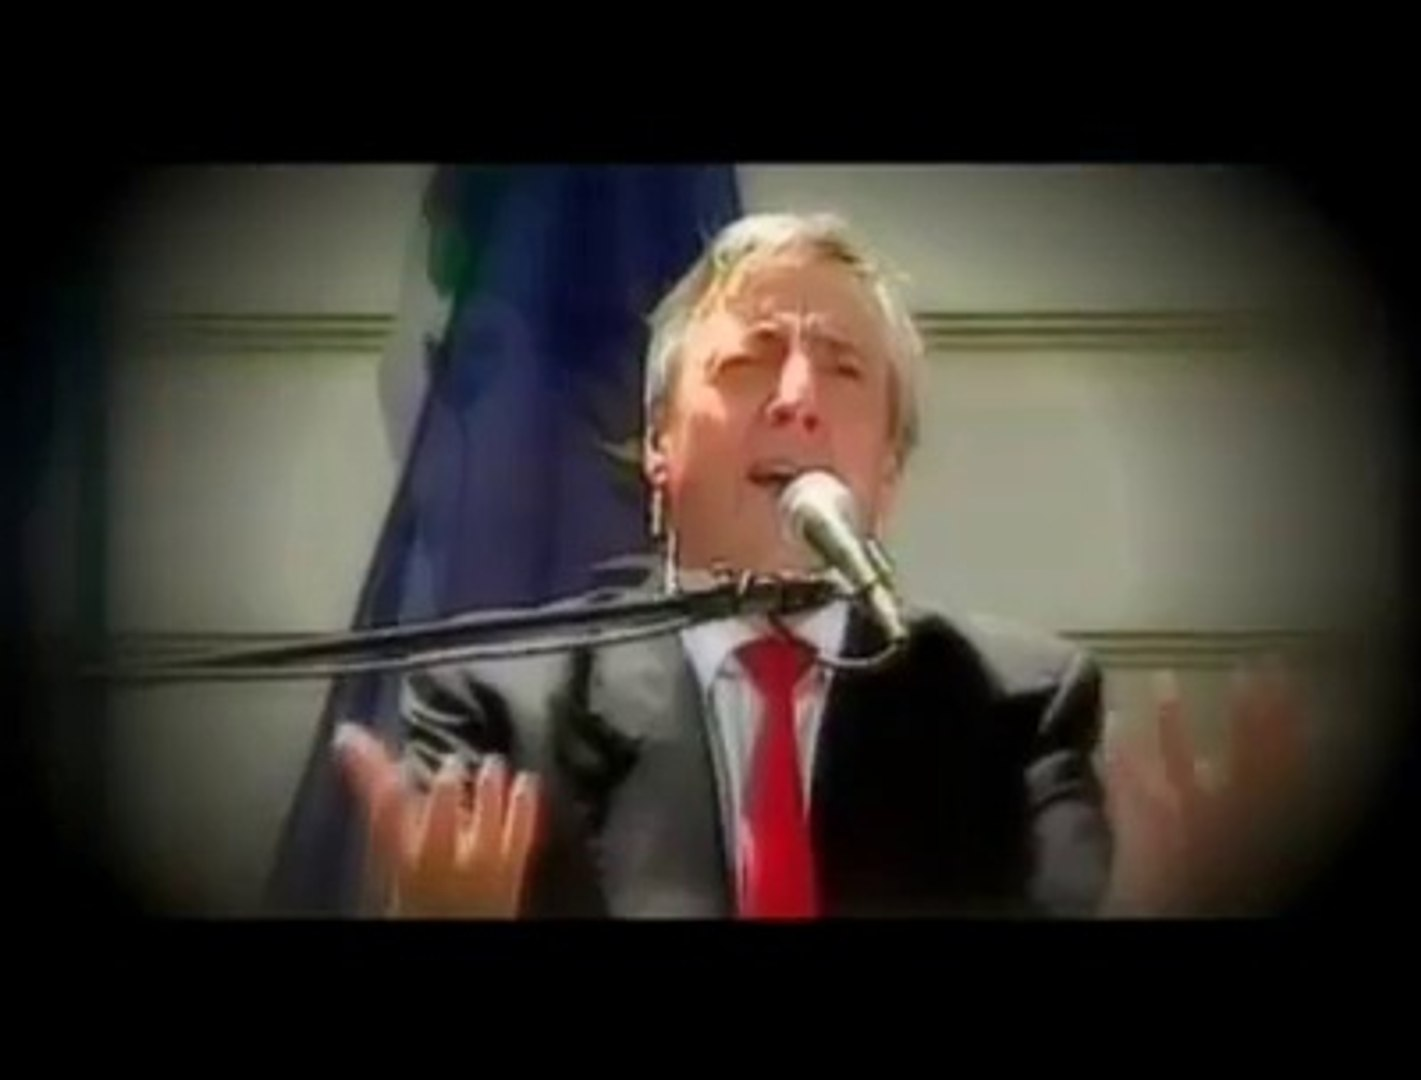 Nestor Kirchner anuncia el tren bala(Bienvenidos al tren)